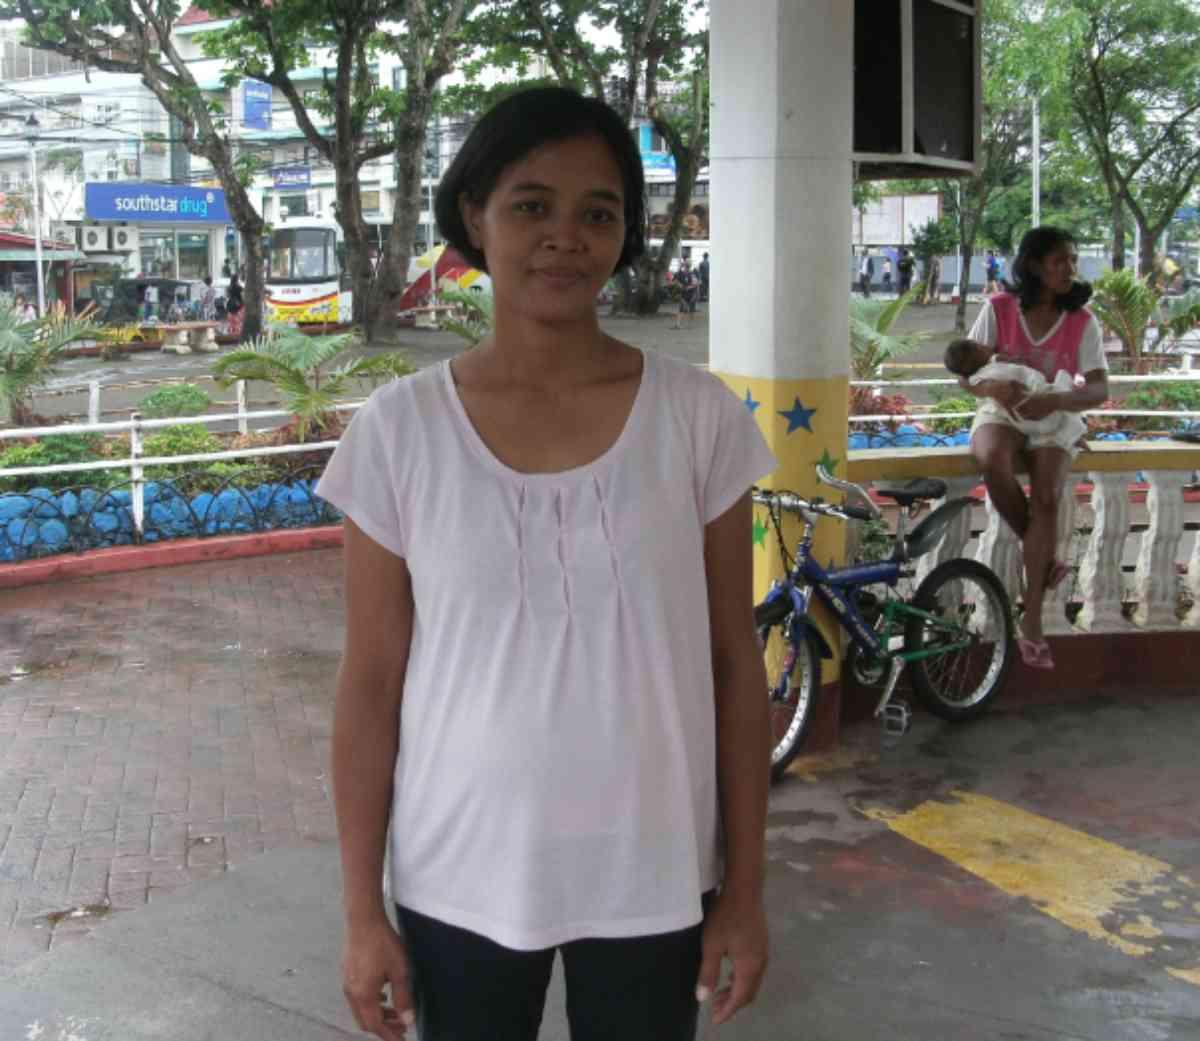 Tabaco District 2 17 2017 Sara Jean Bernal Pregnant Mother On Program